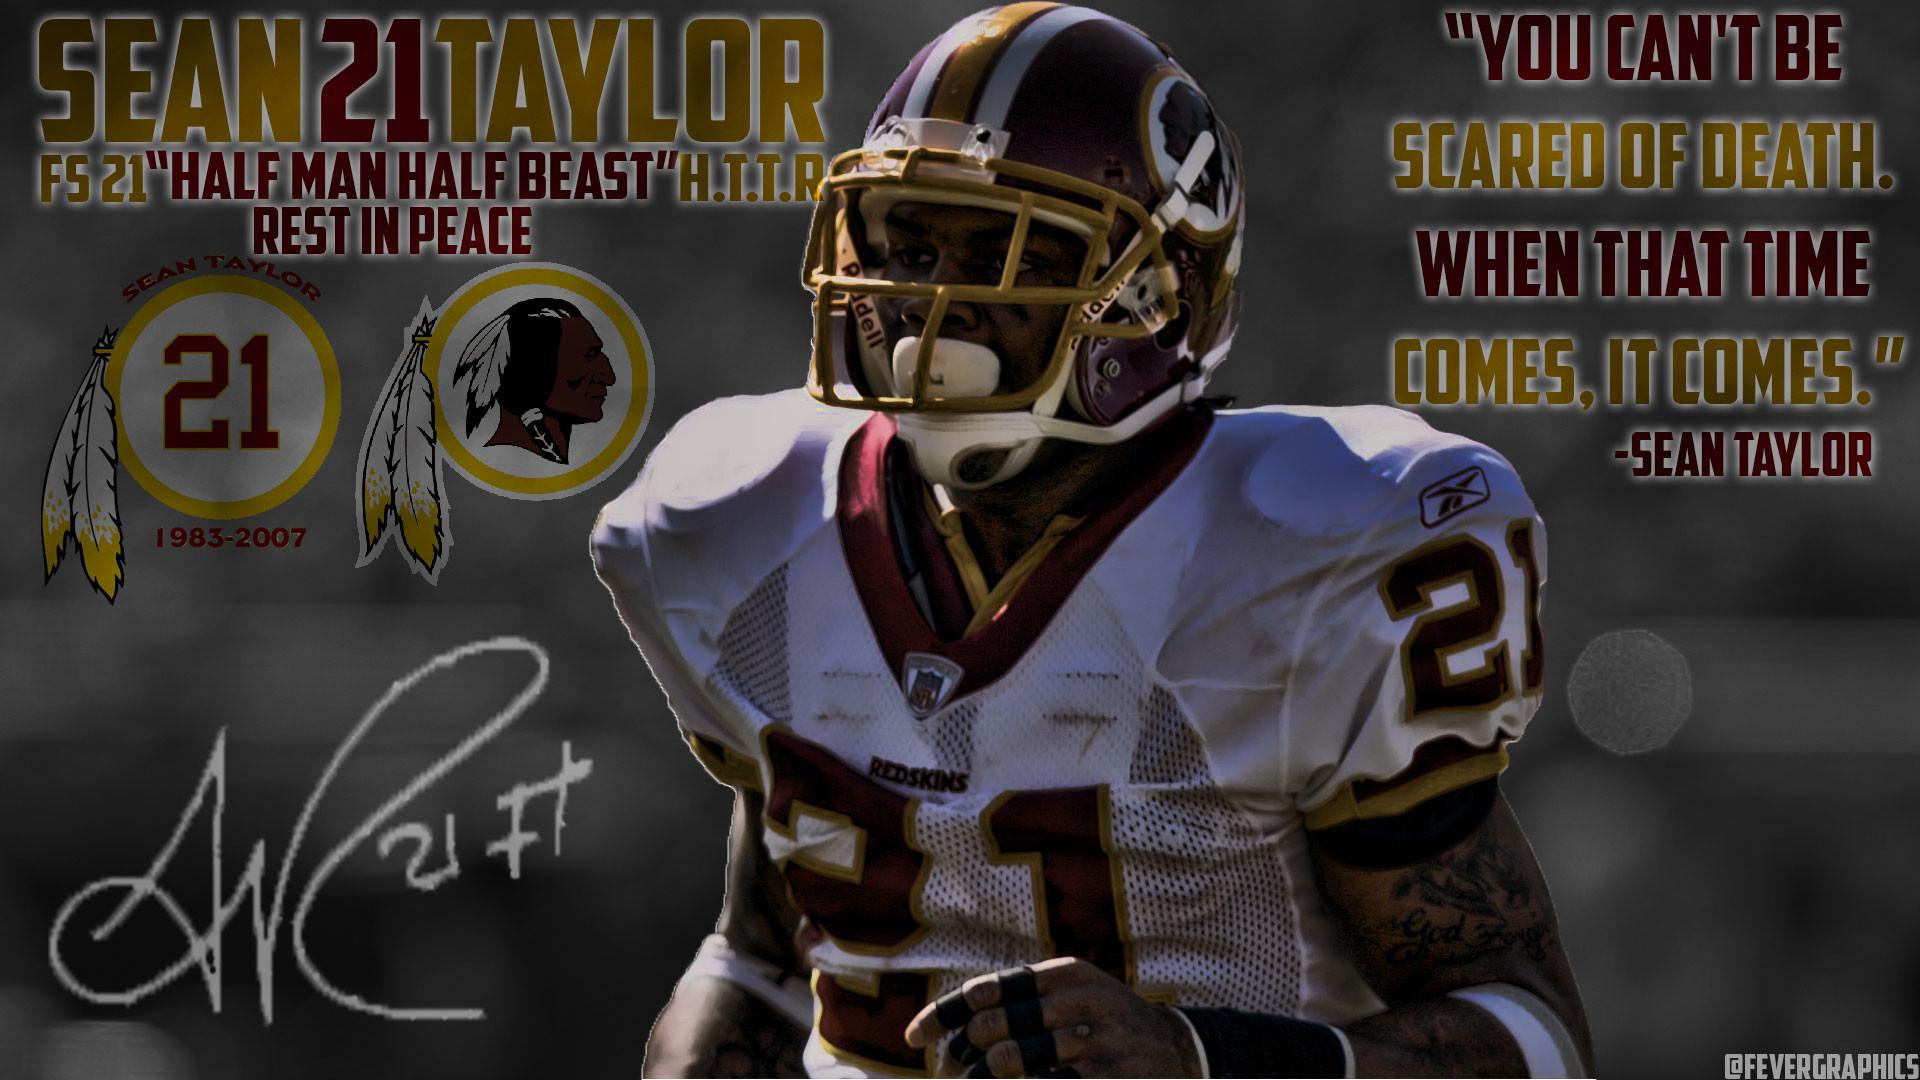 Redskins sub! I made you guys a Sean Taylor wallpaper (RIP) I hope you guys  like my work! I do take suggestions!